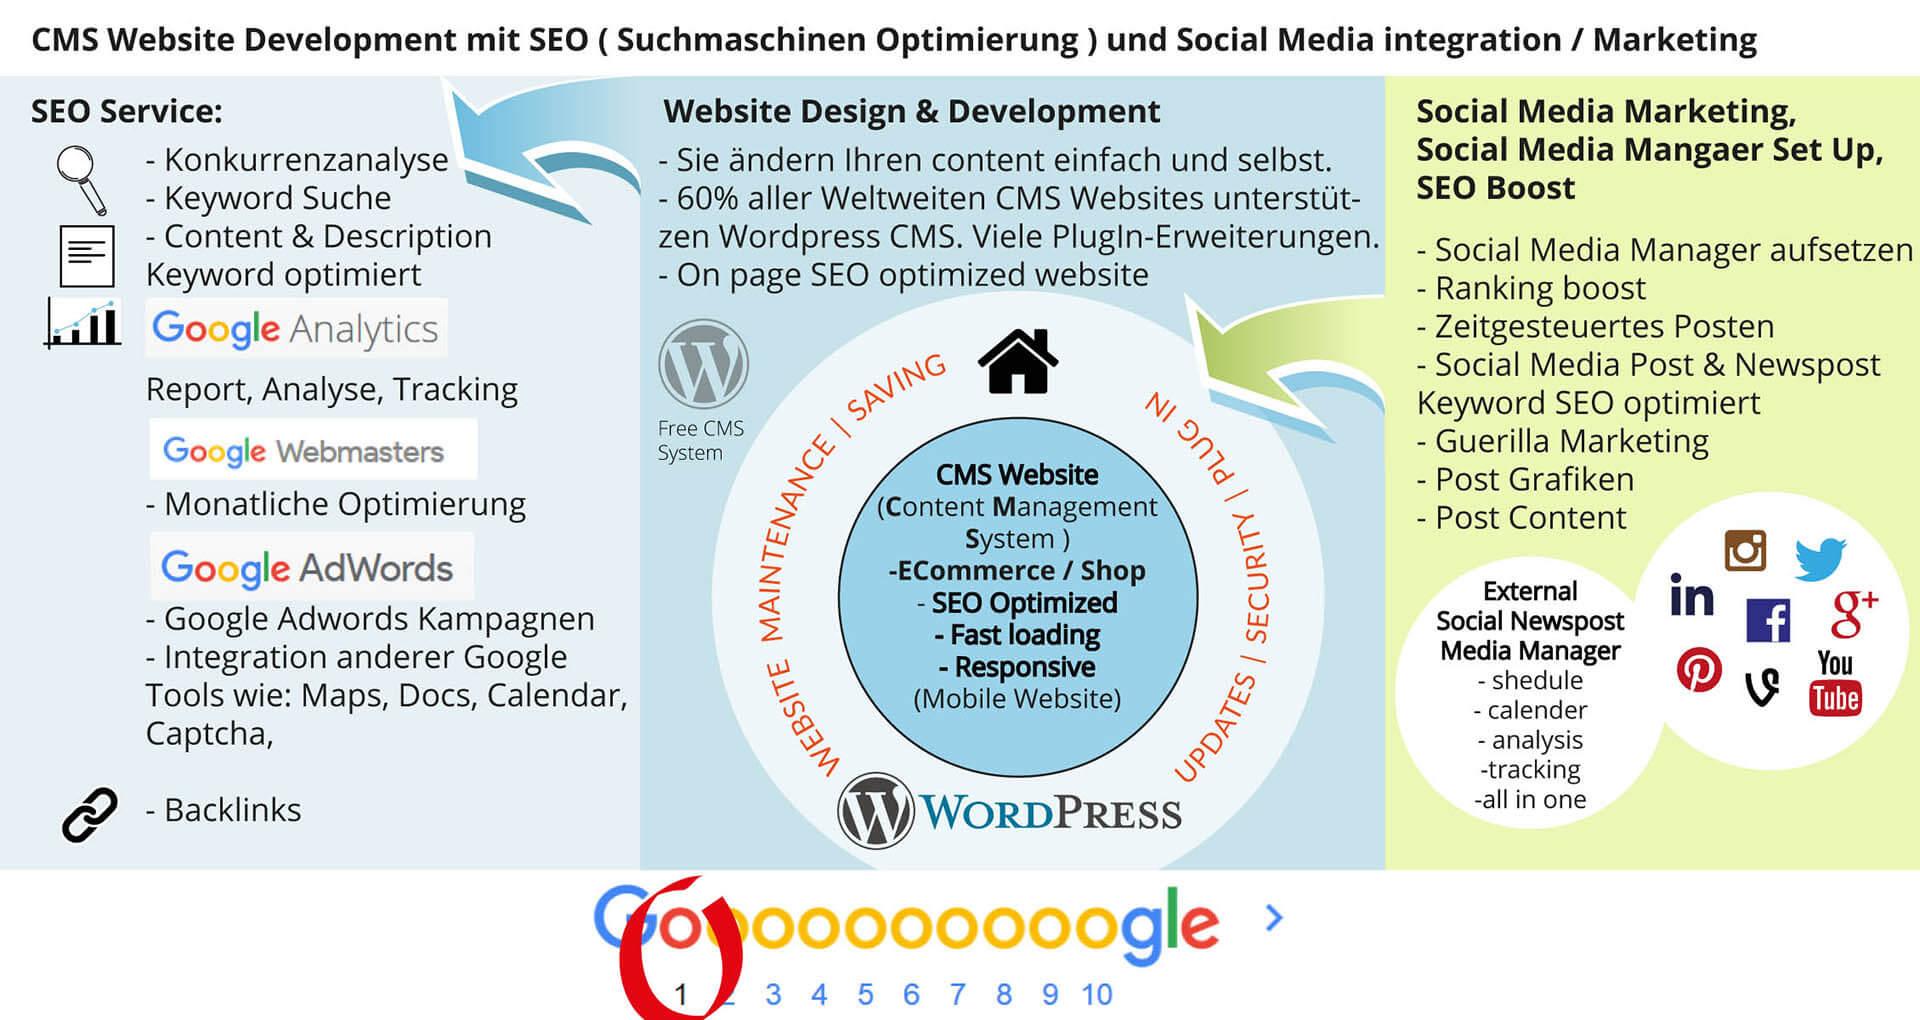 webdesign online marketing seo suchmaschinenoptimierung google social media marketing facebook twitter 1